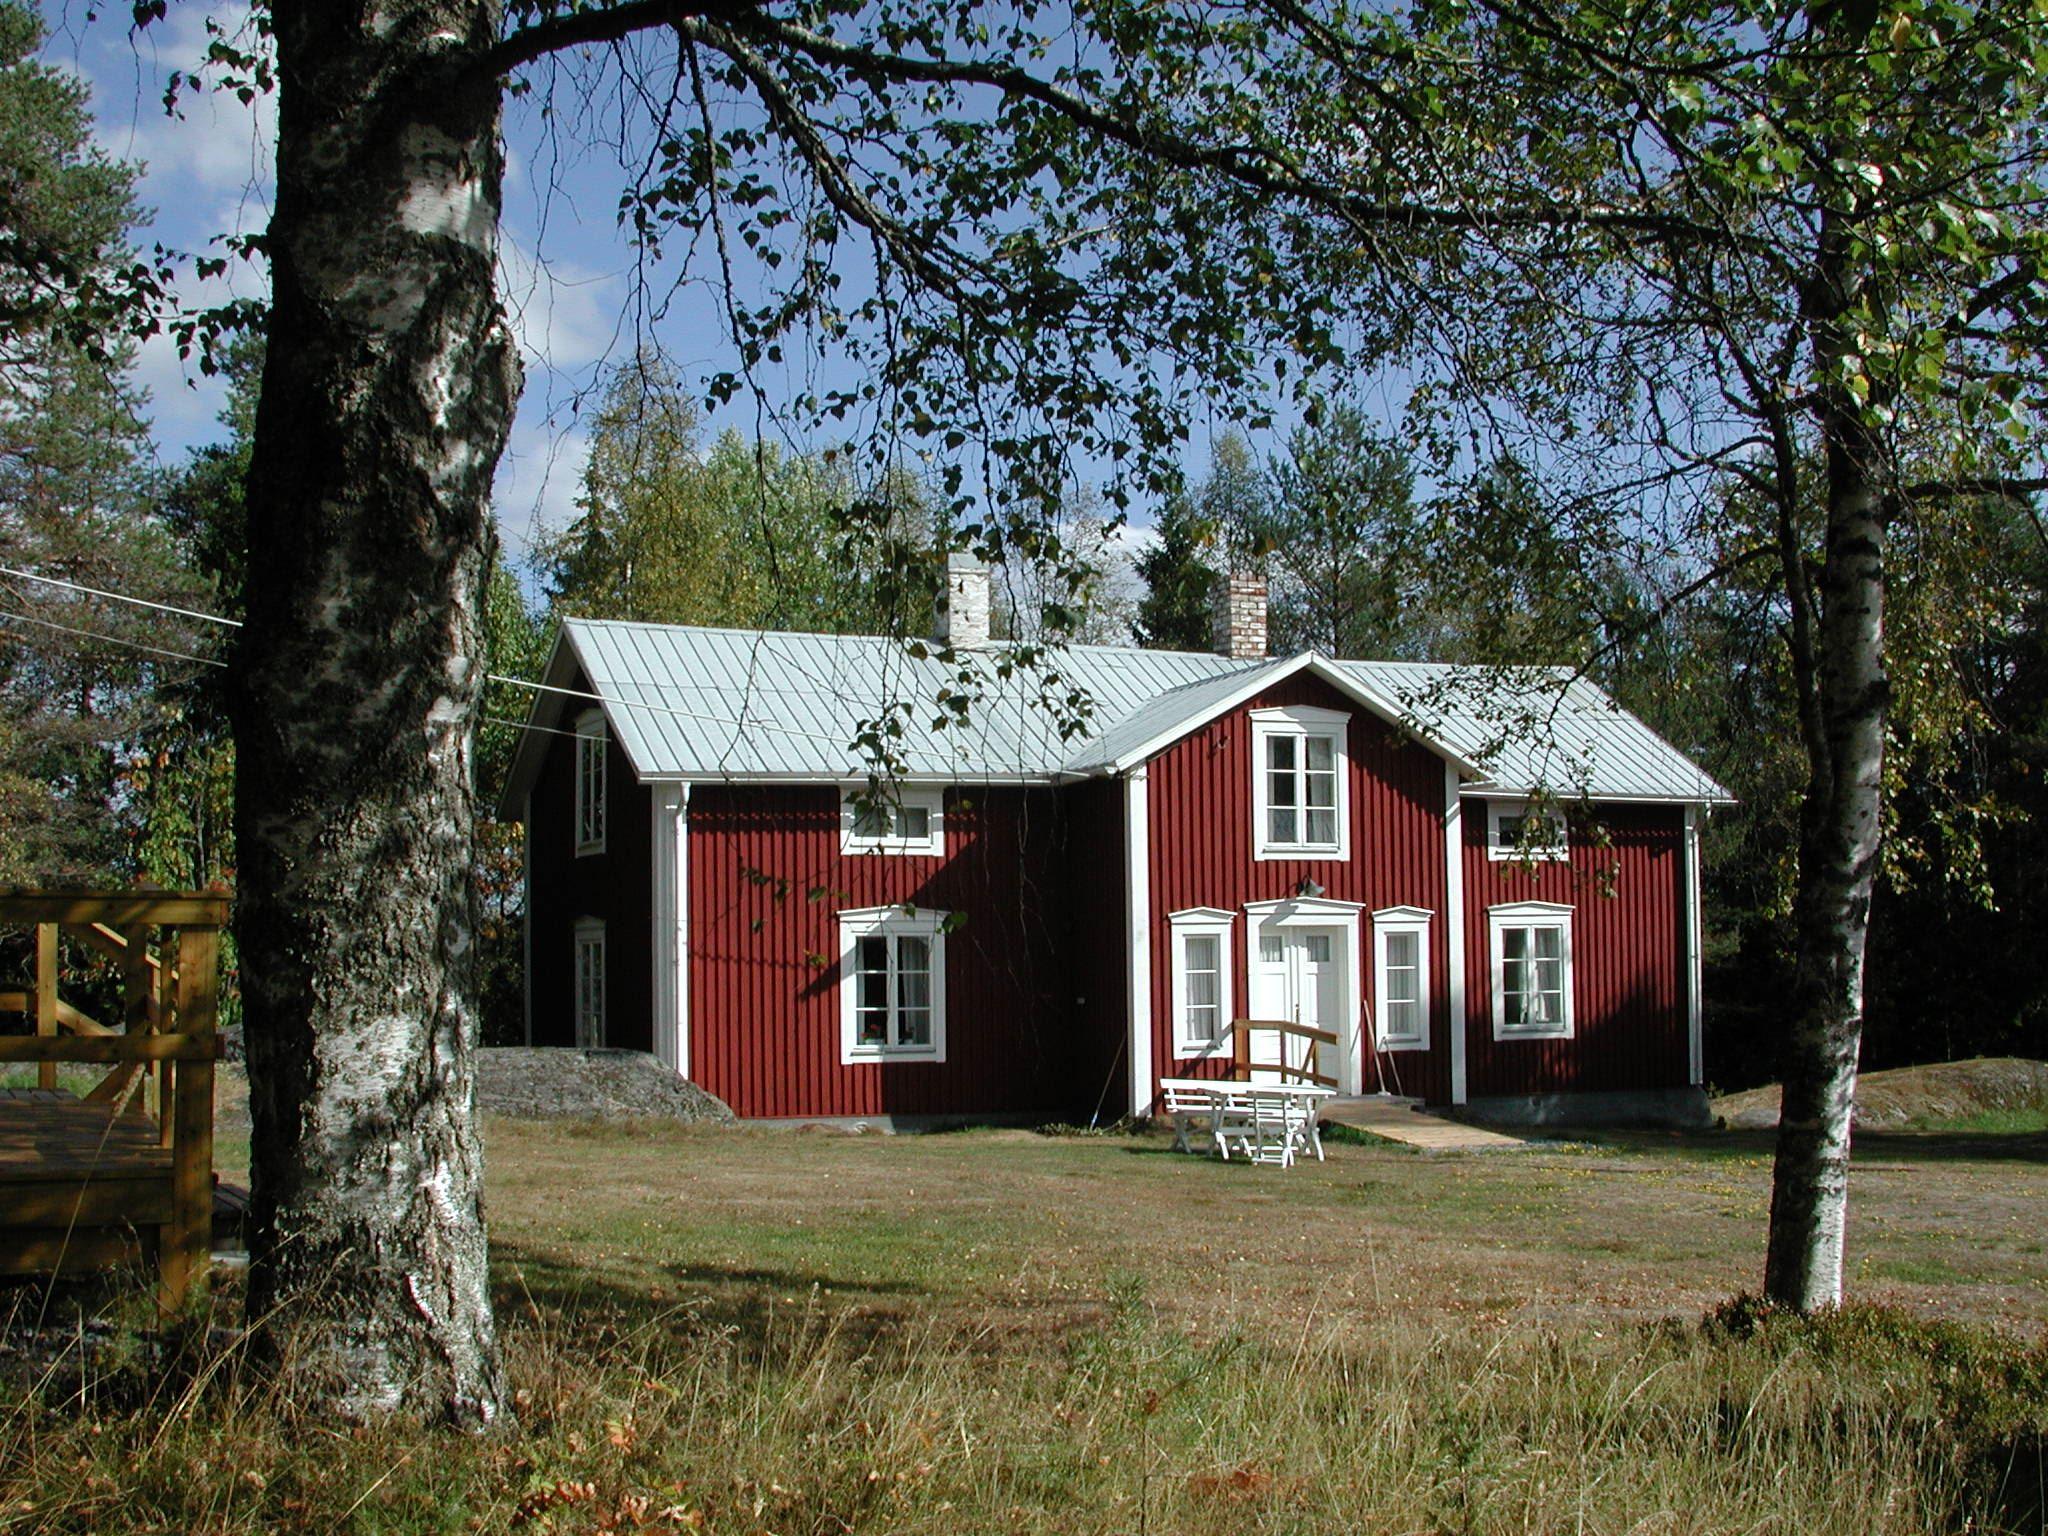 Galgbacken homestead heritage site, Ånäset